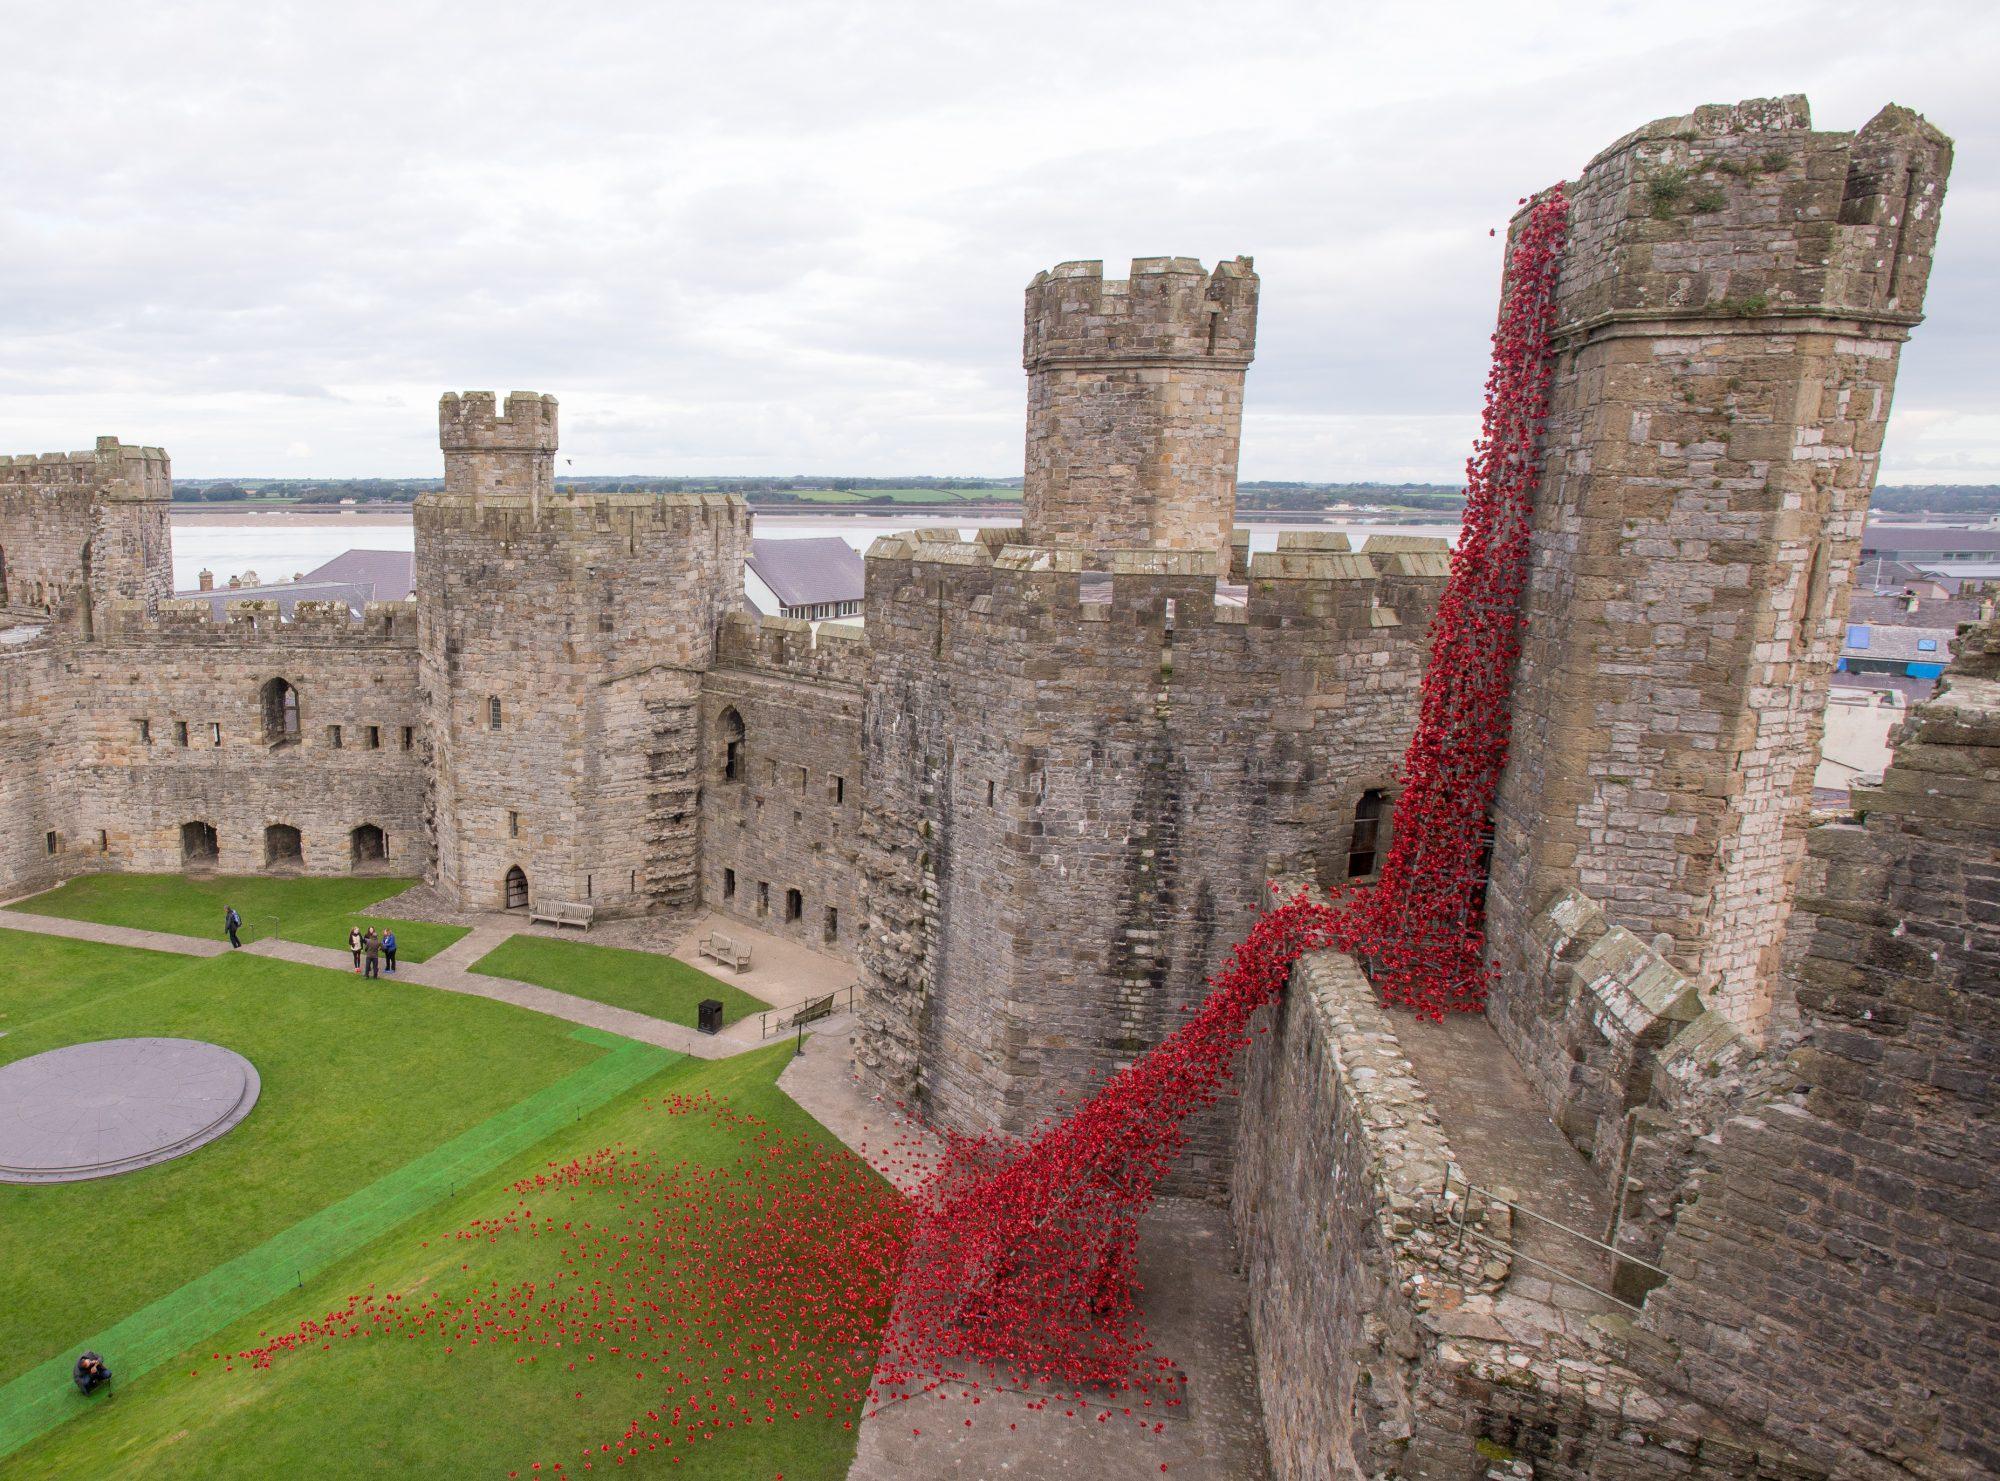 Iconic Poppy Sculpture Opens At Caernarfon Castle